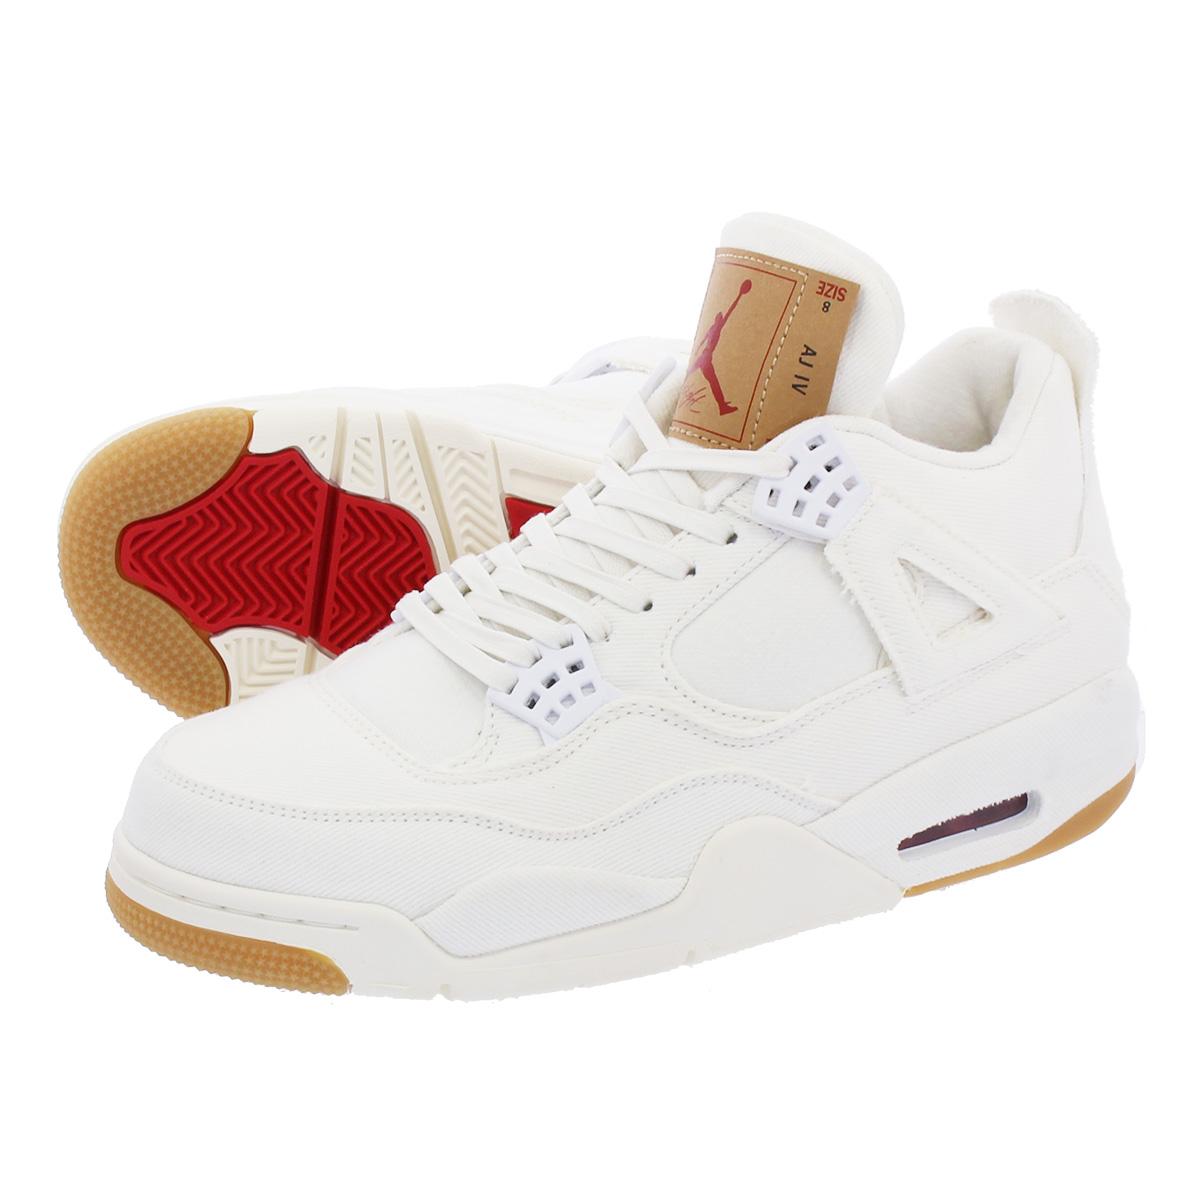 e4391317a38f86 NIKE AIR JORDAN 4 RETRO NRG Nike air Jordan 4 nostalgic NRG Levis WHITE WHITE  ao2571-100